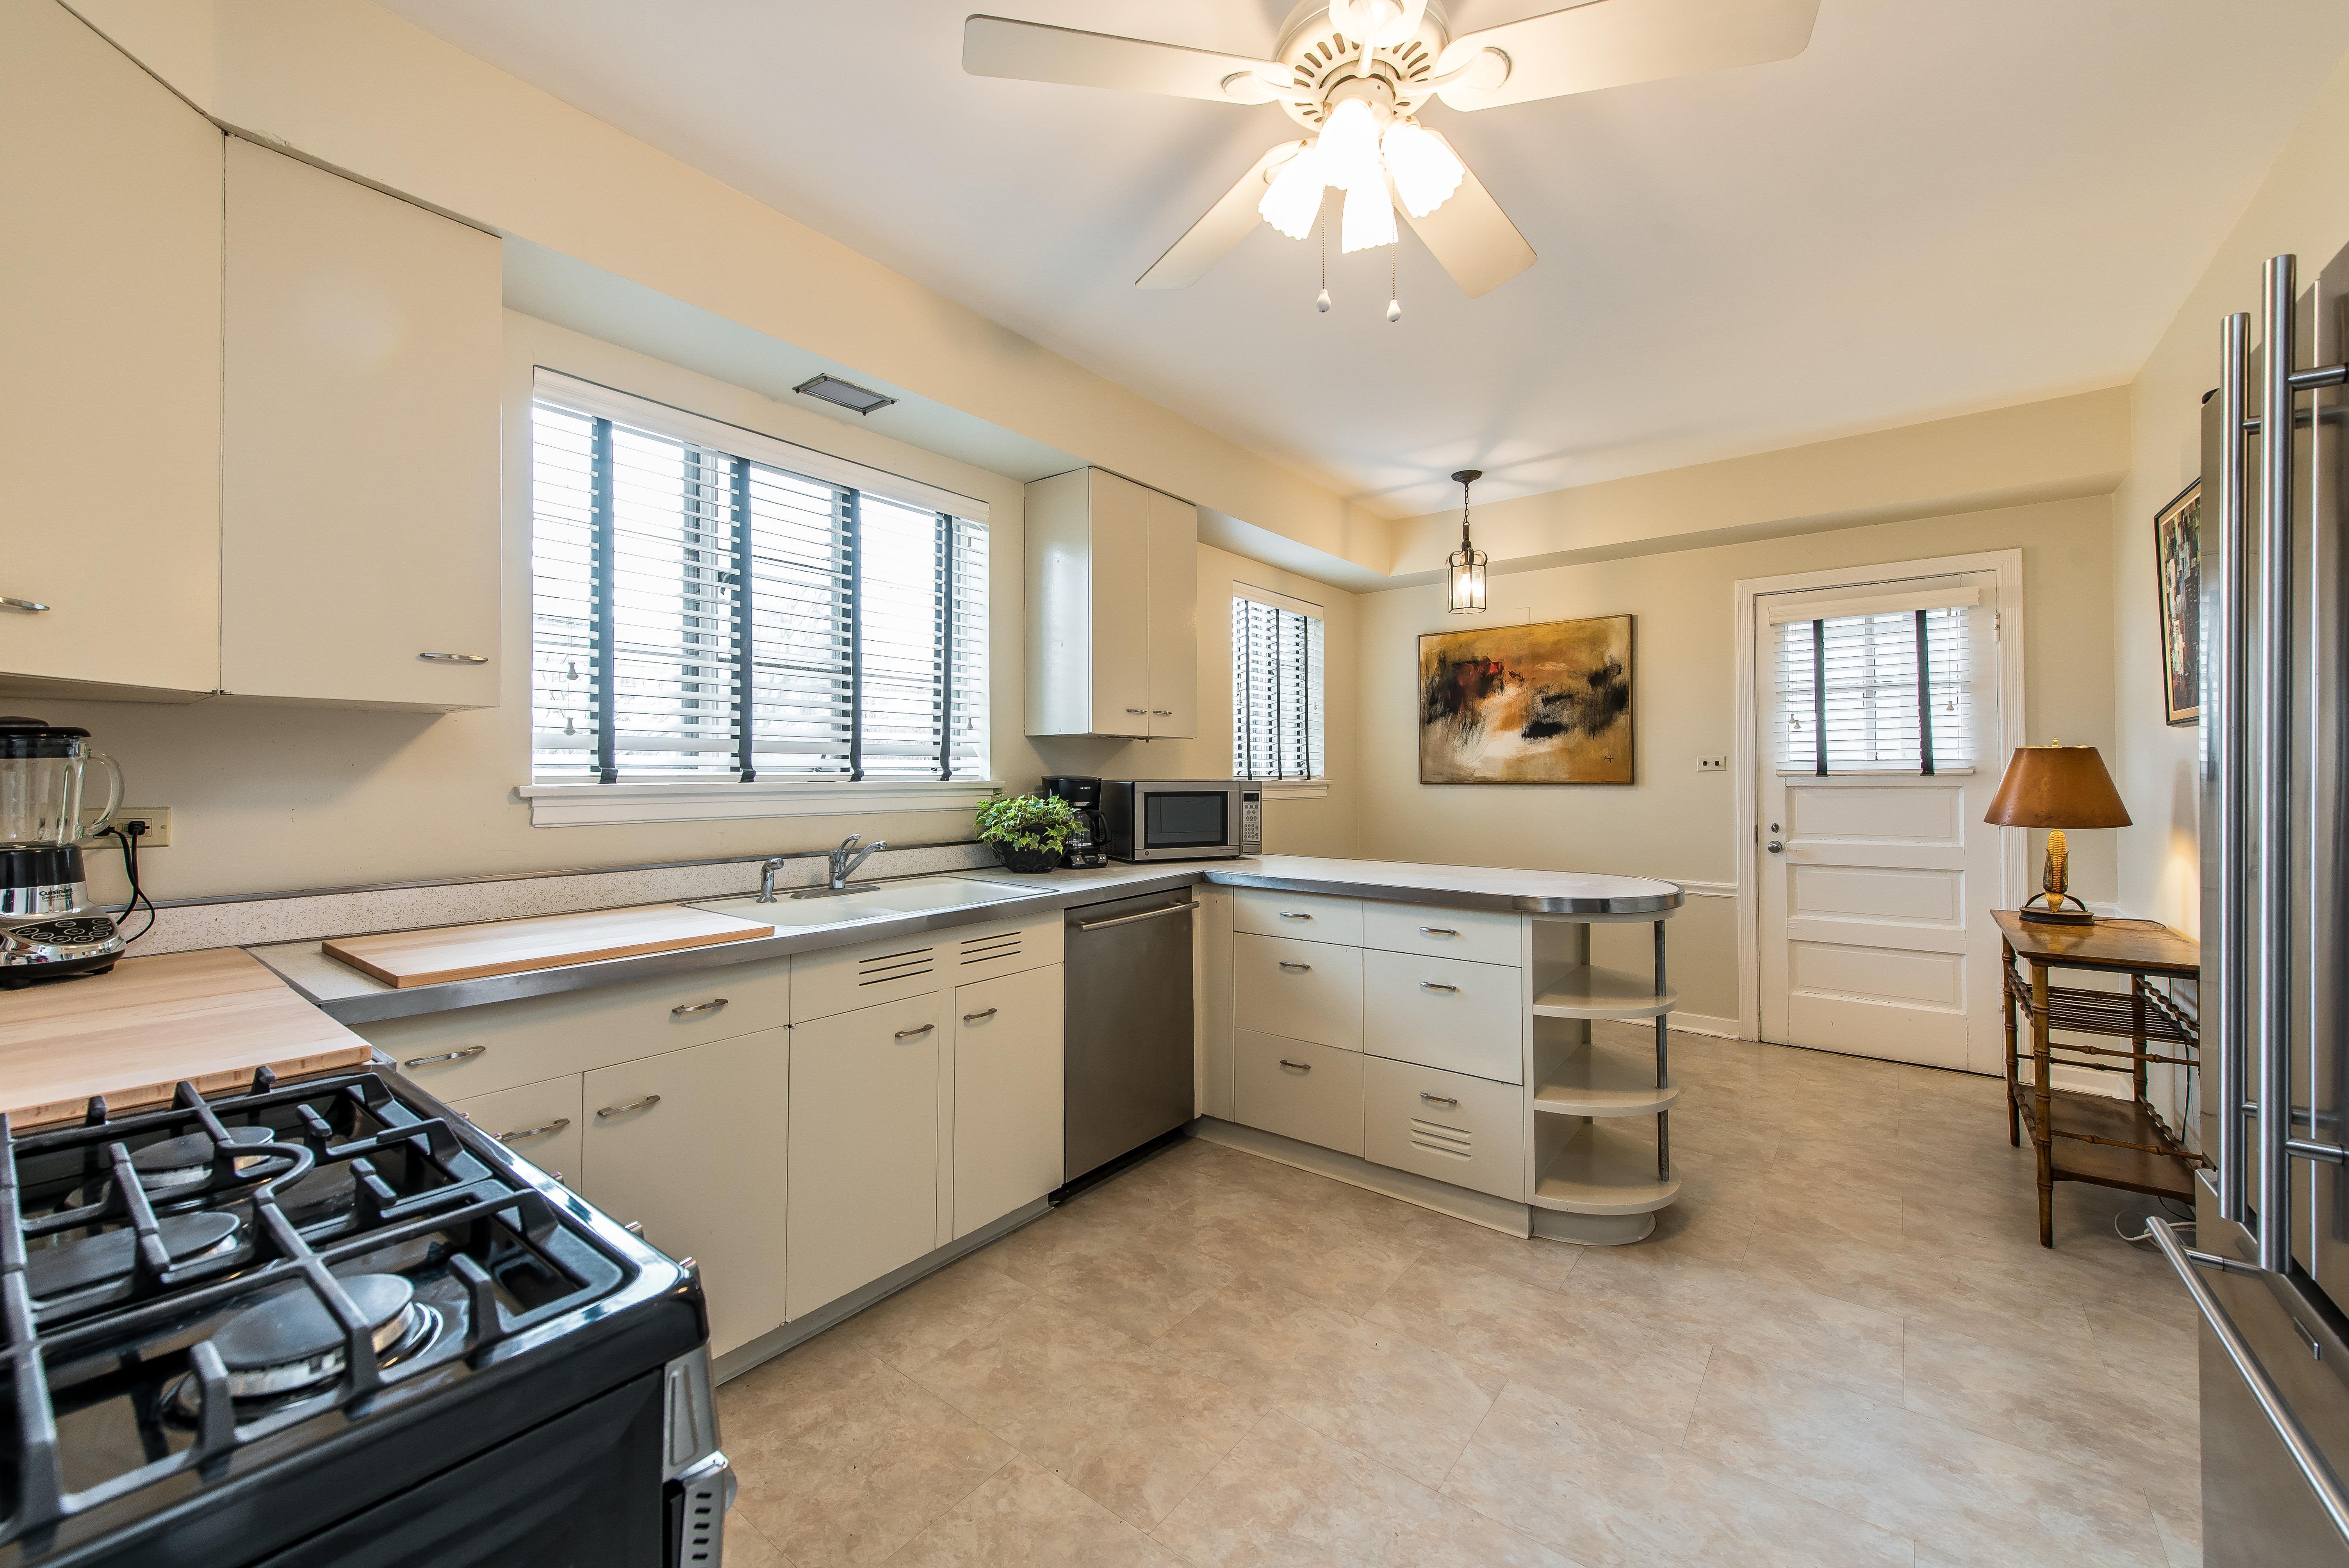 2151 Thornwood kitchen